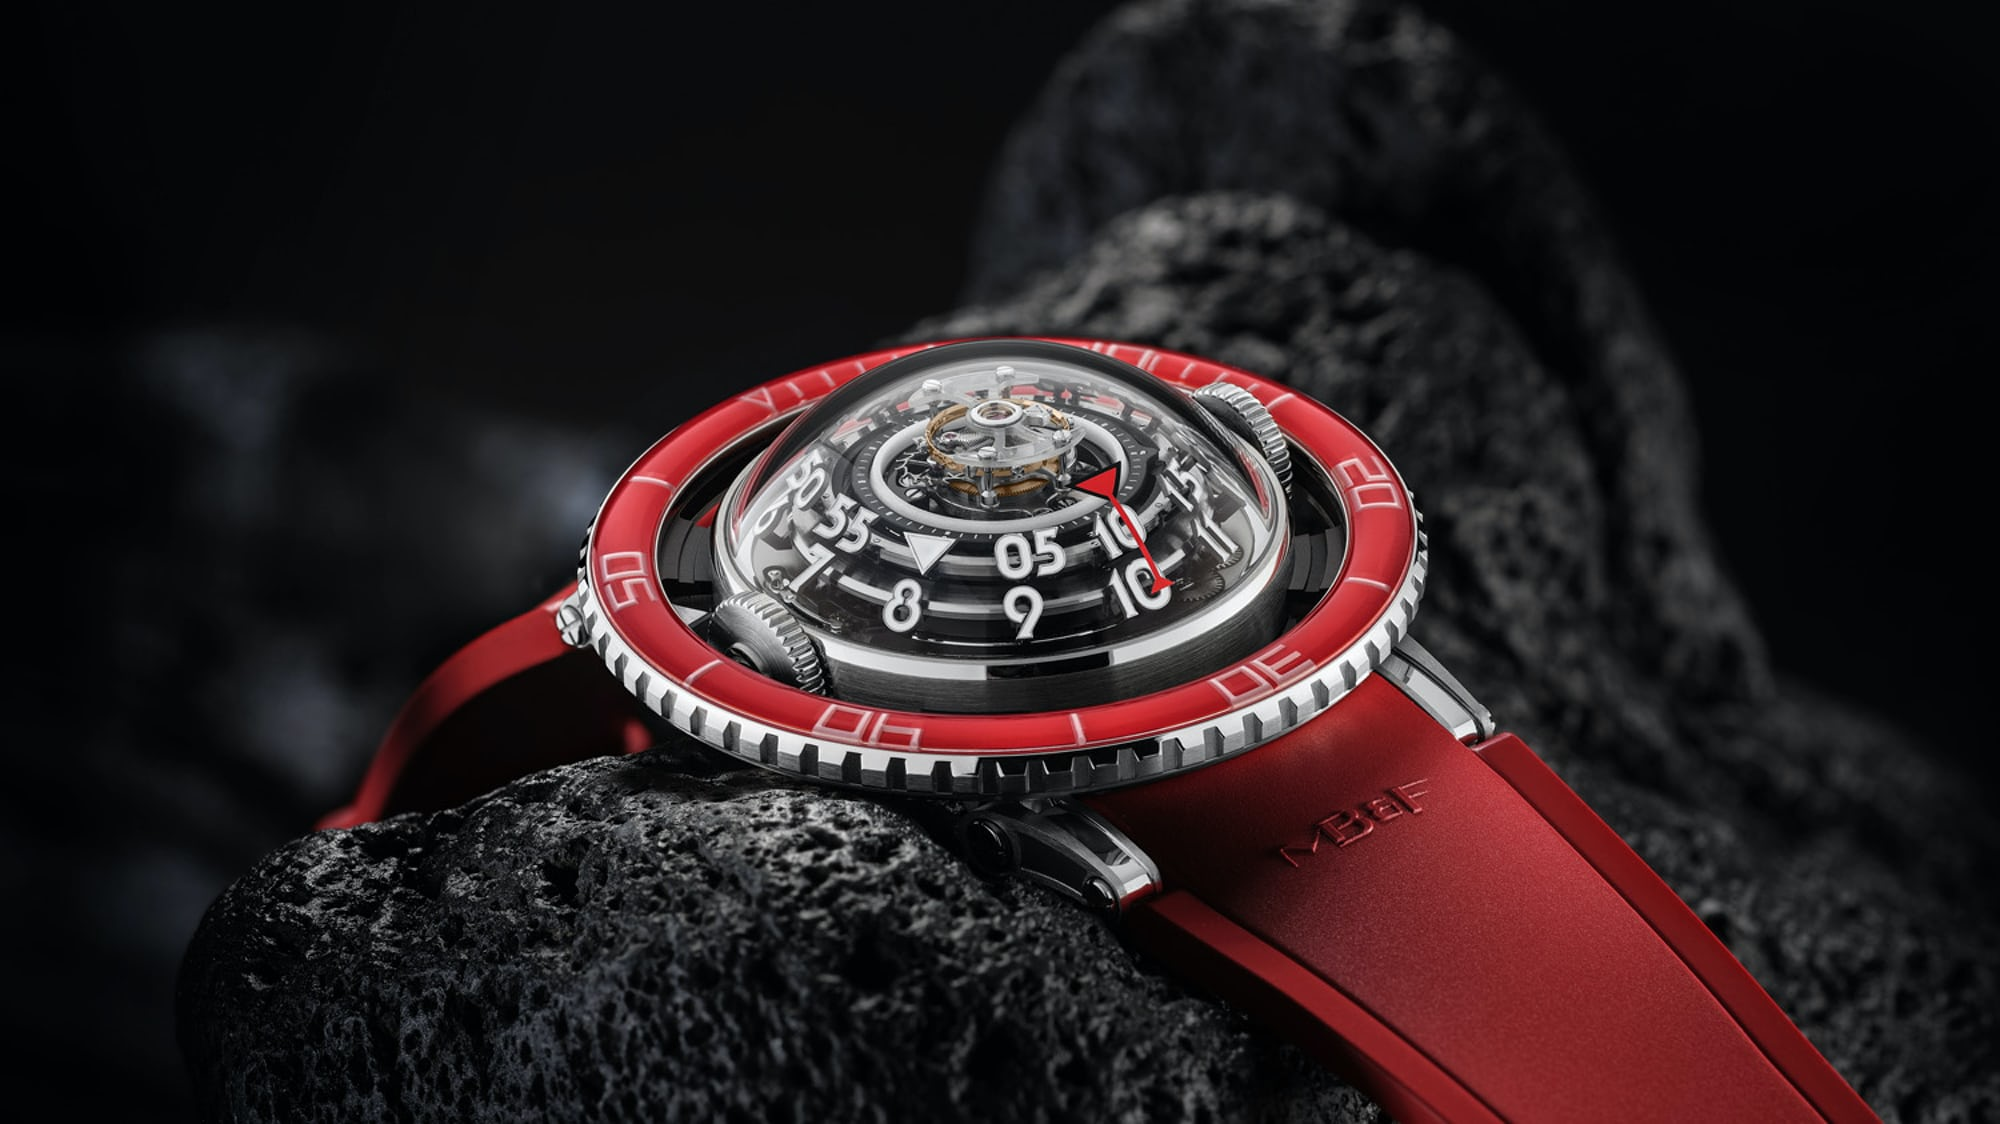 Introducing: The MB&F HM7 Aquapod Platinum Red